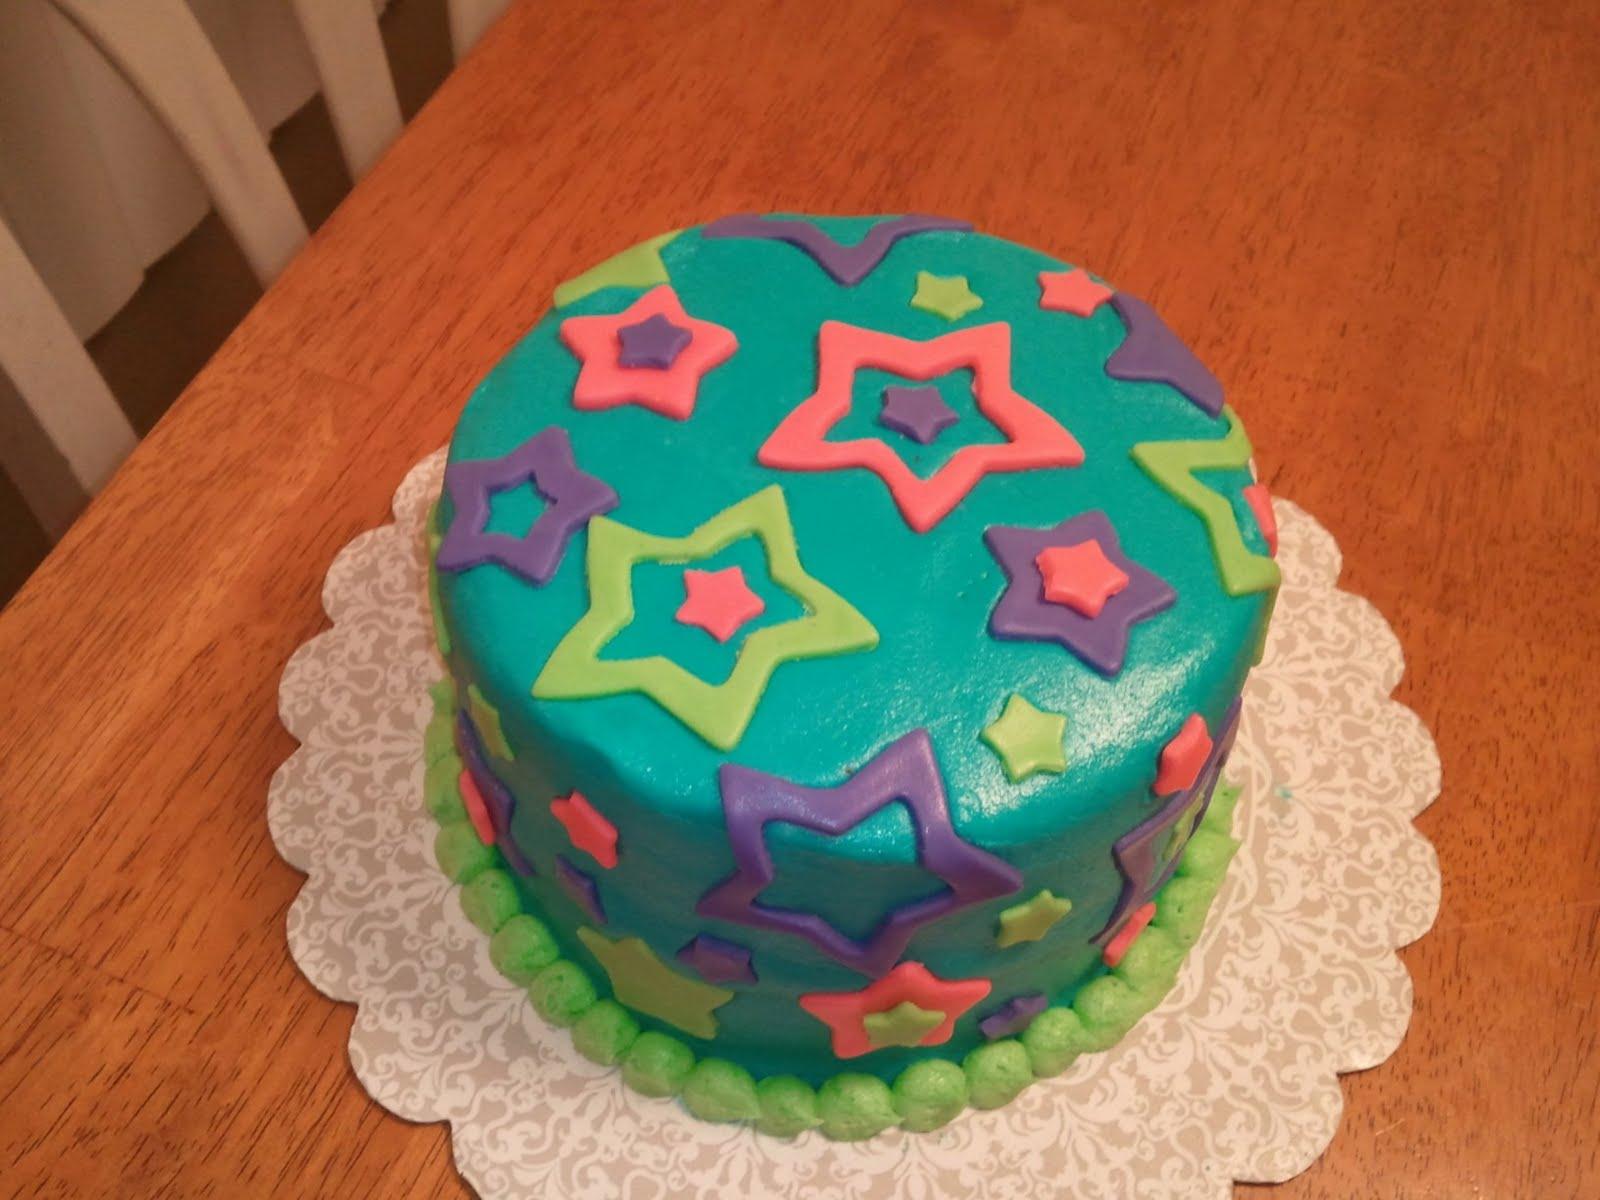 Kristis 26th Birthday Cake